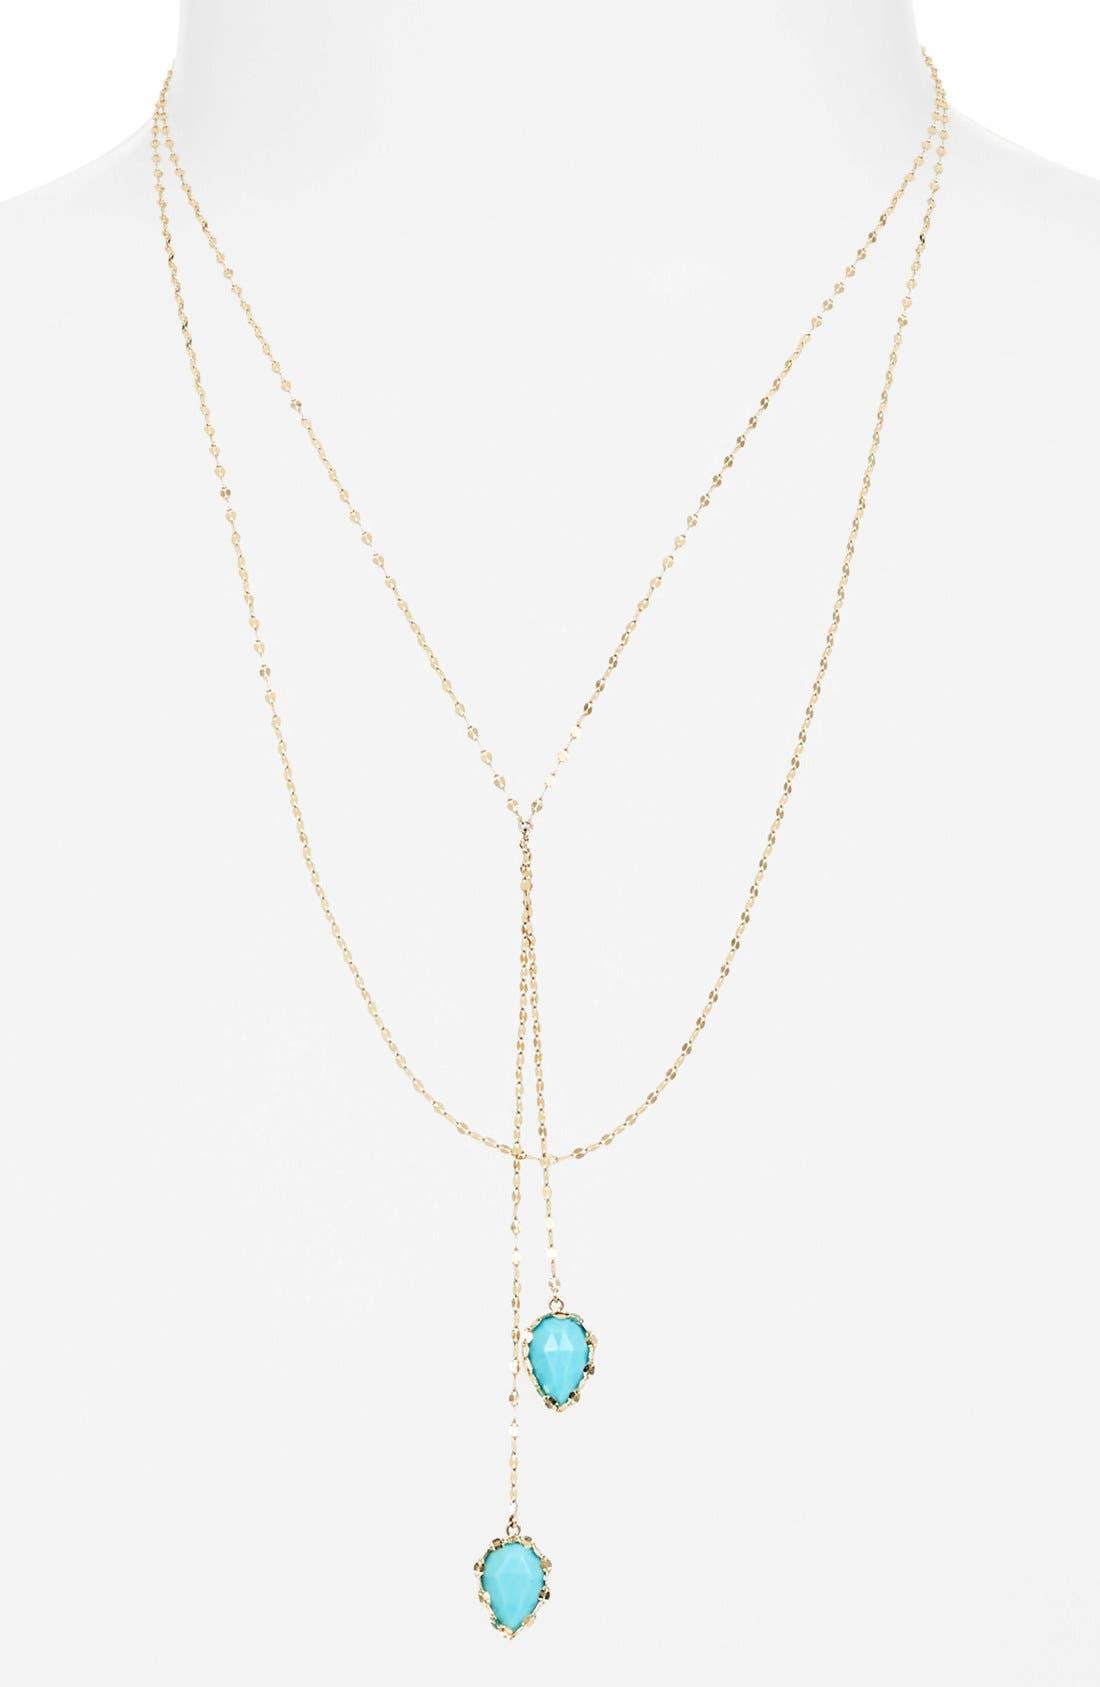 Main Image - Lana Jewelry 'Blush' Lariat Necklace